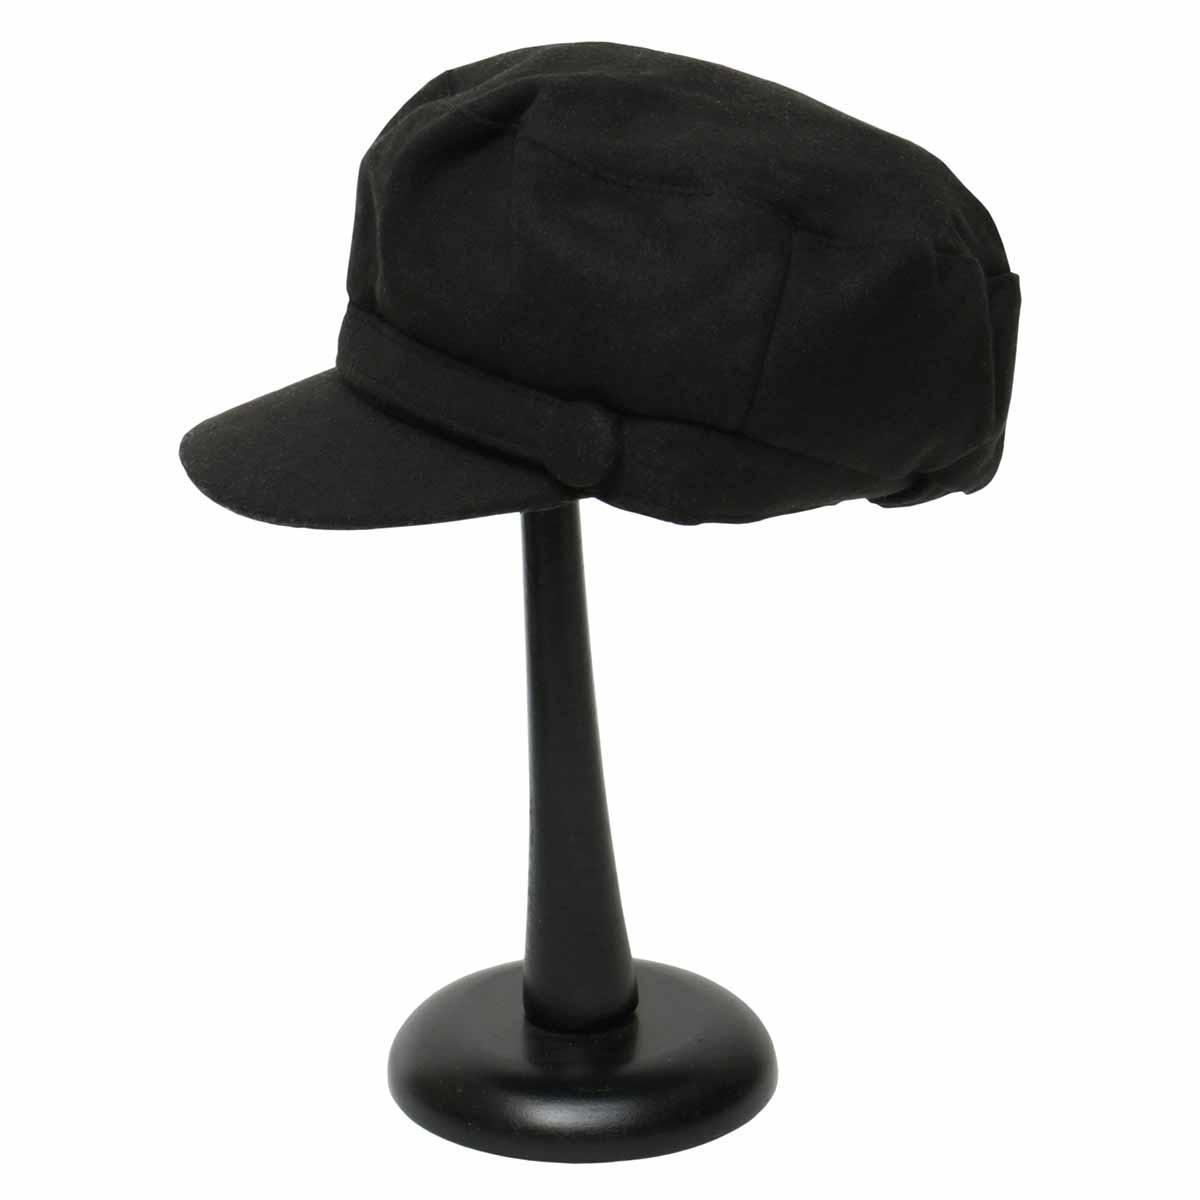 BK 2 BUTTON CAP